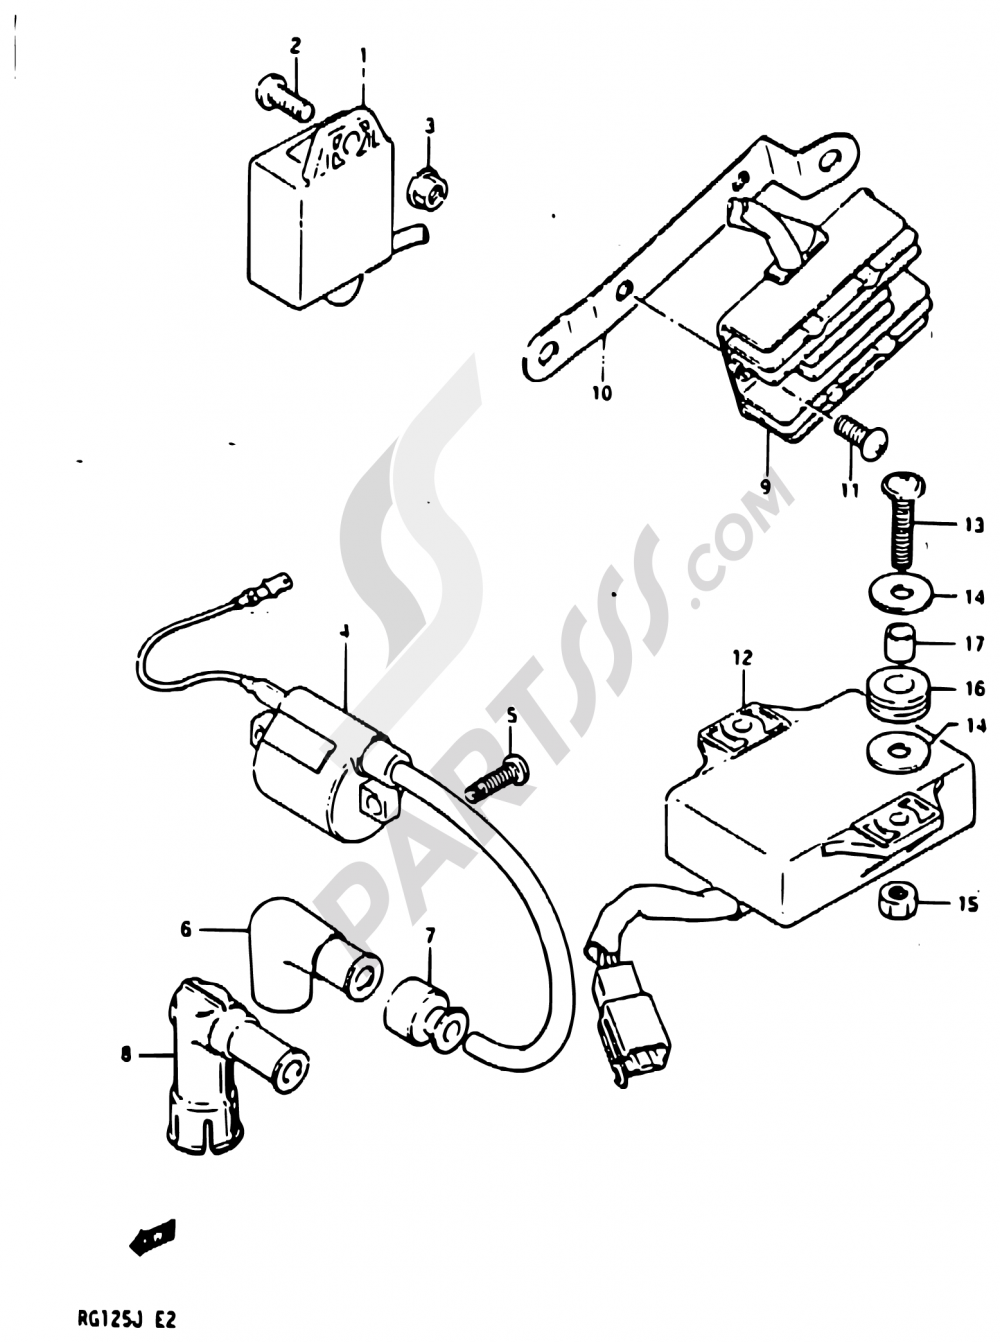 17 - ELECTRICAL Suzuki RG125C 1986